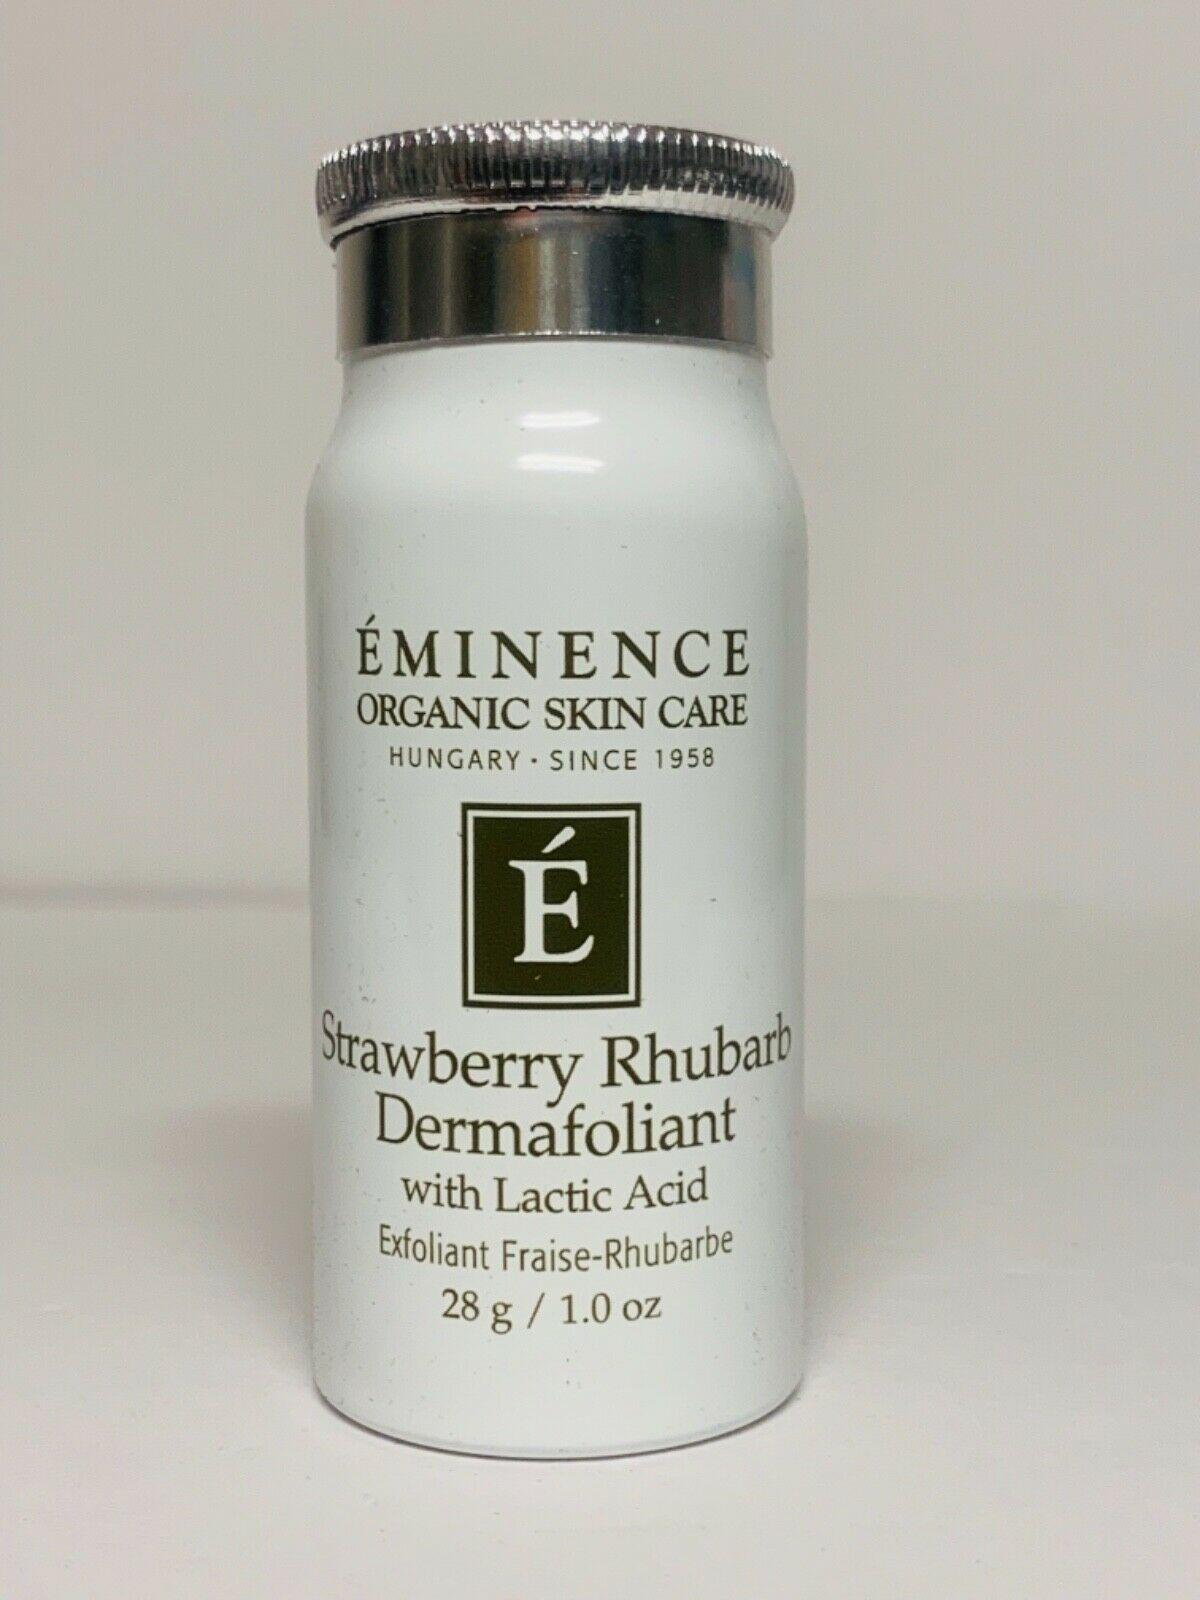 Eminence Organic Skin Care Strawberry Rhubarb Dermafoliant 28g/1 oz Travel Size 1